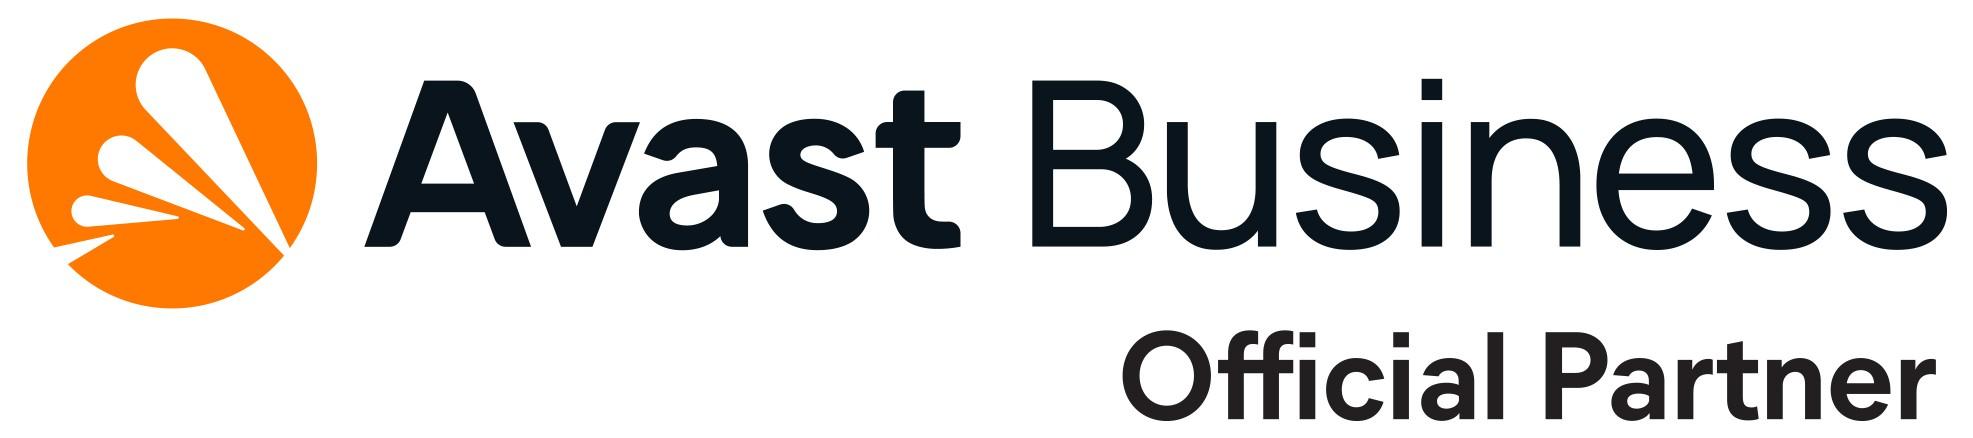 AvastBusiness_OfficialPartnerLogo